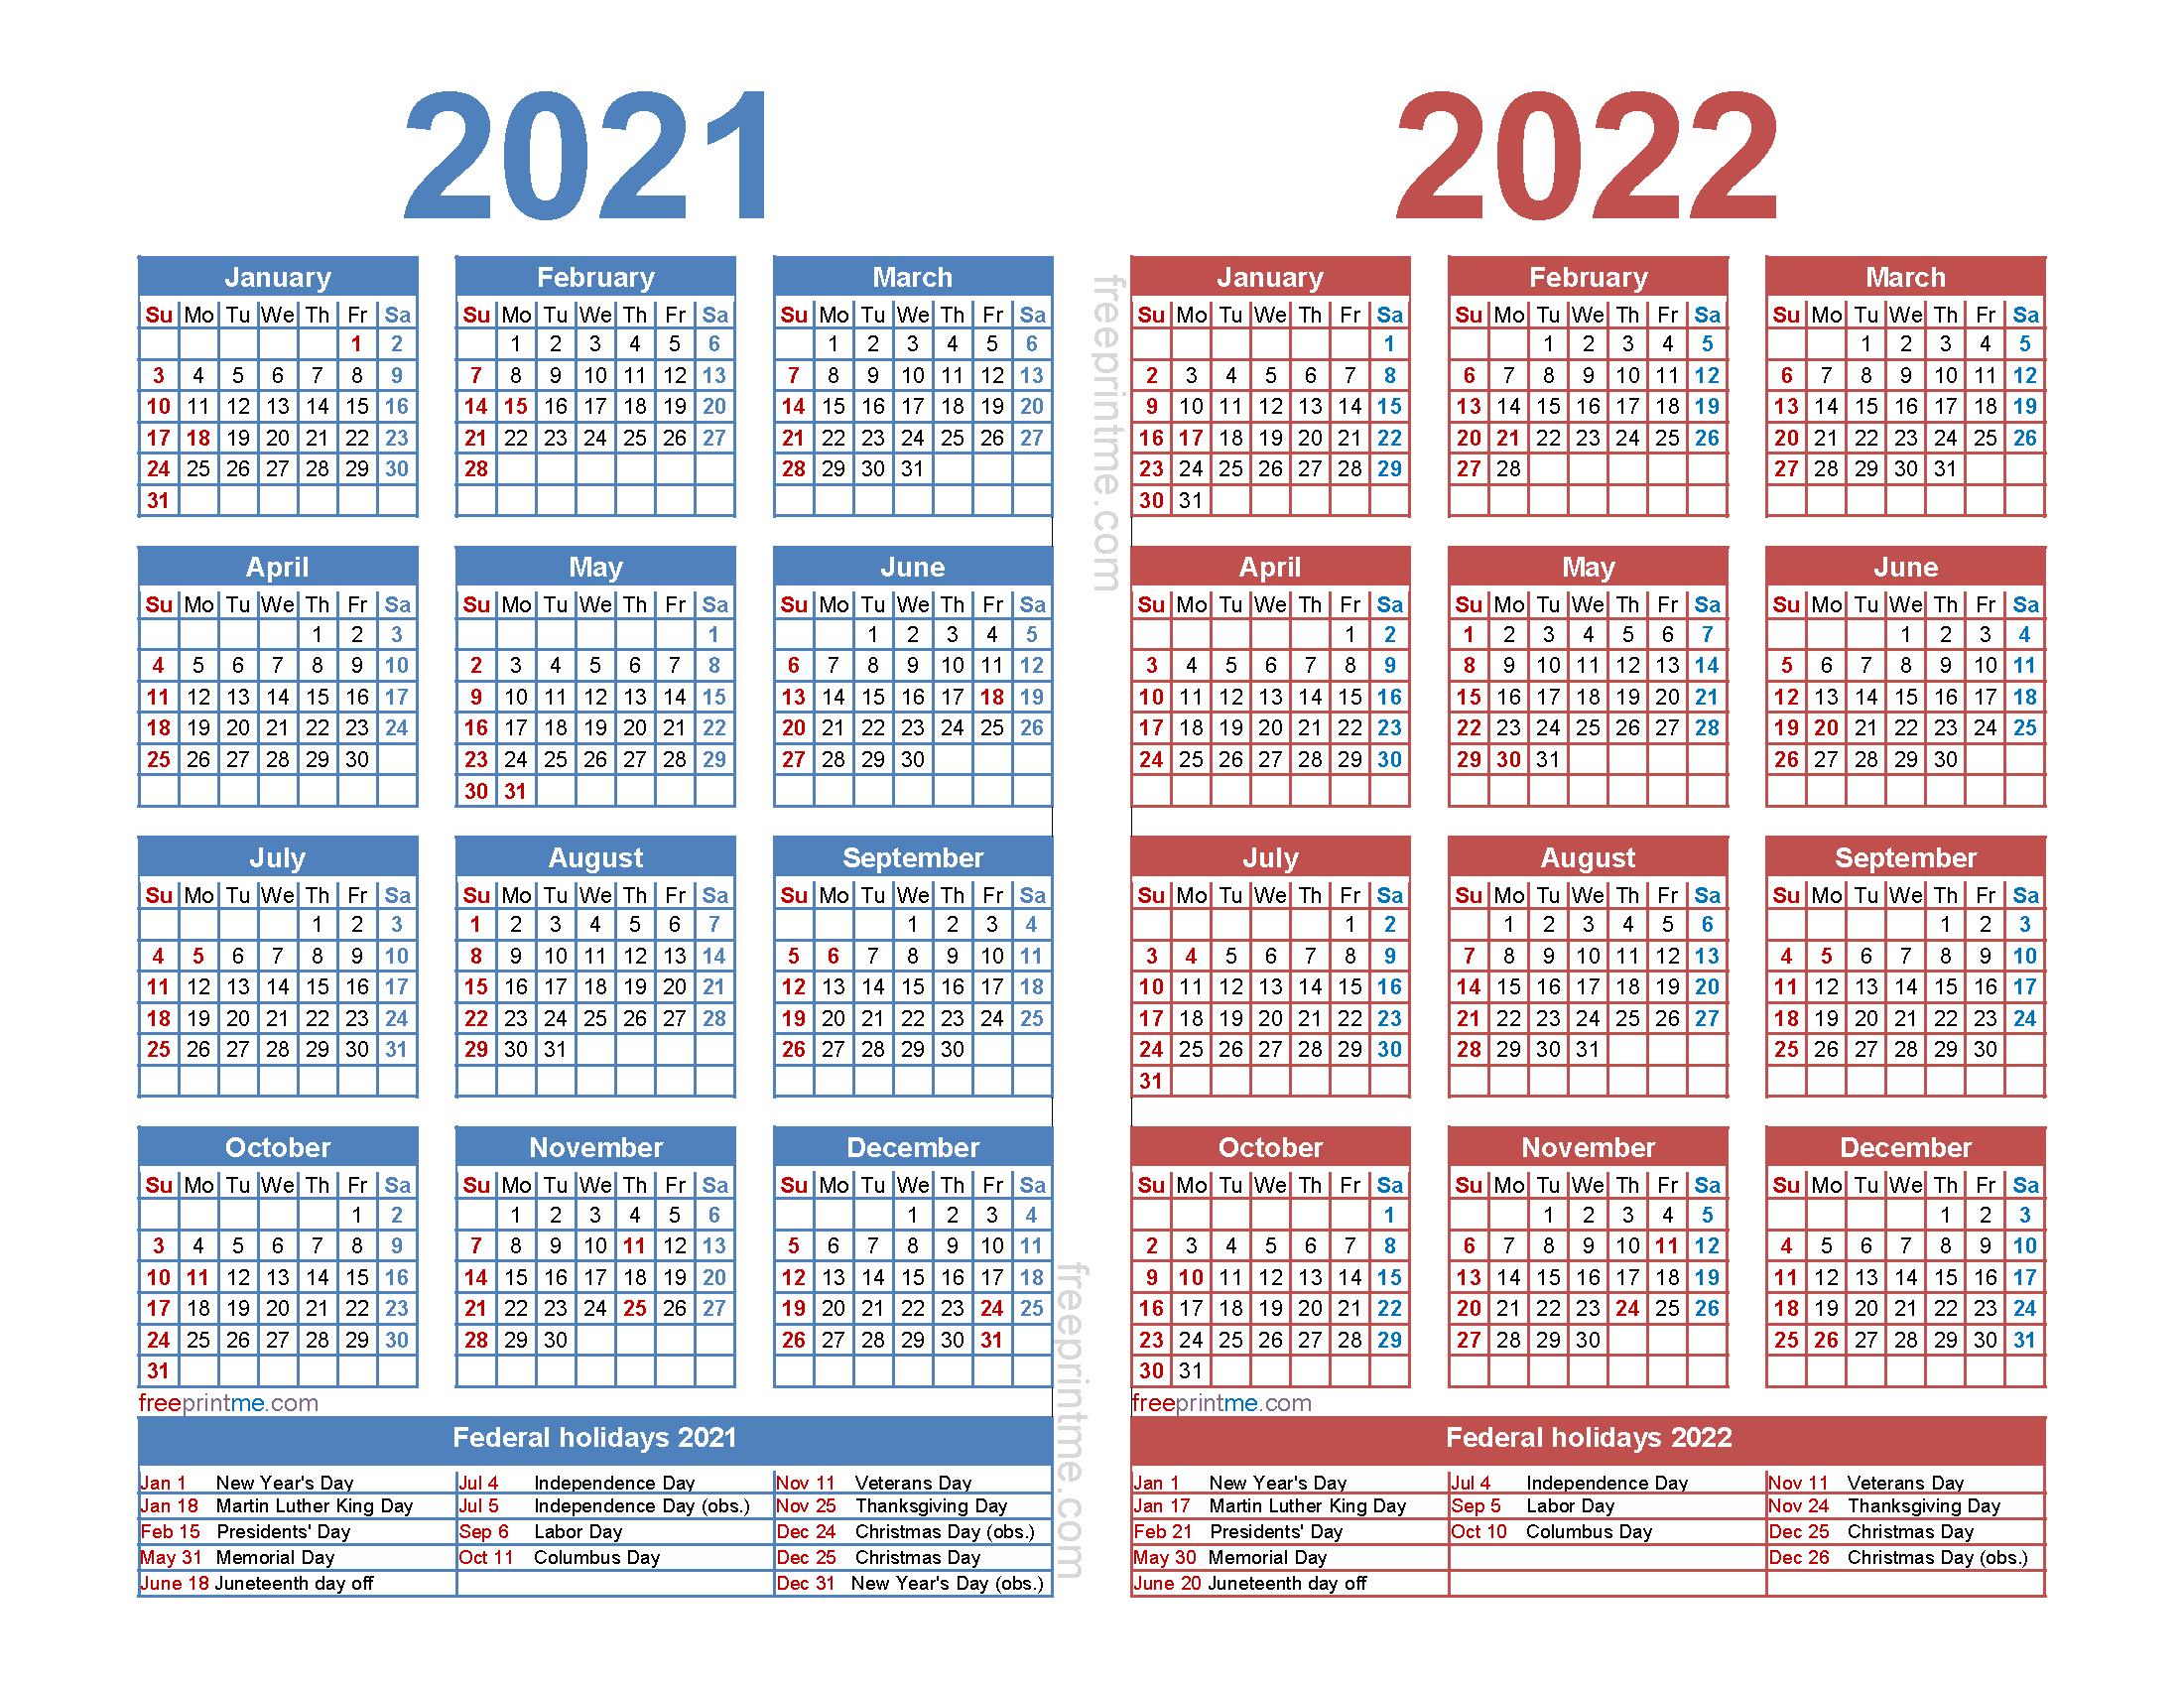 Free 2021 and 2022 Calendar Printable with Holidays as PDF and Image